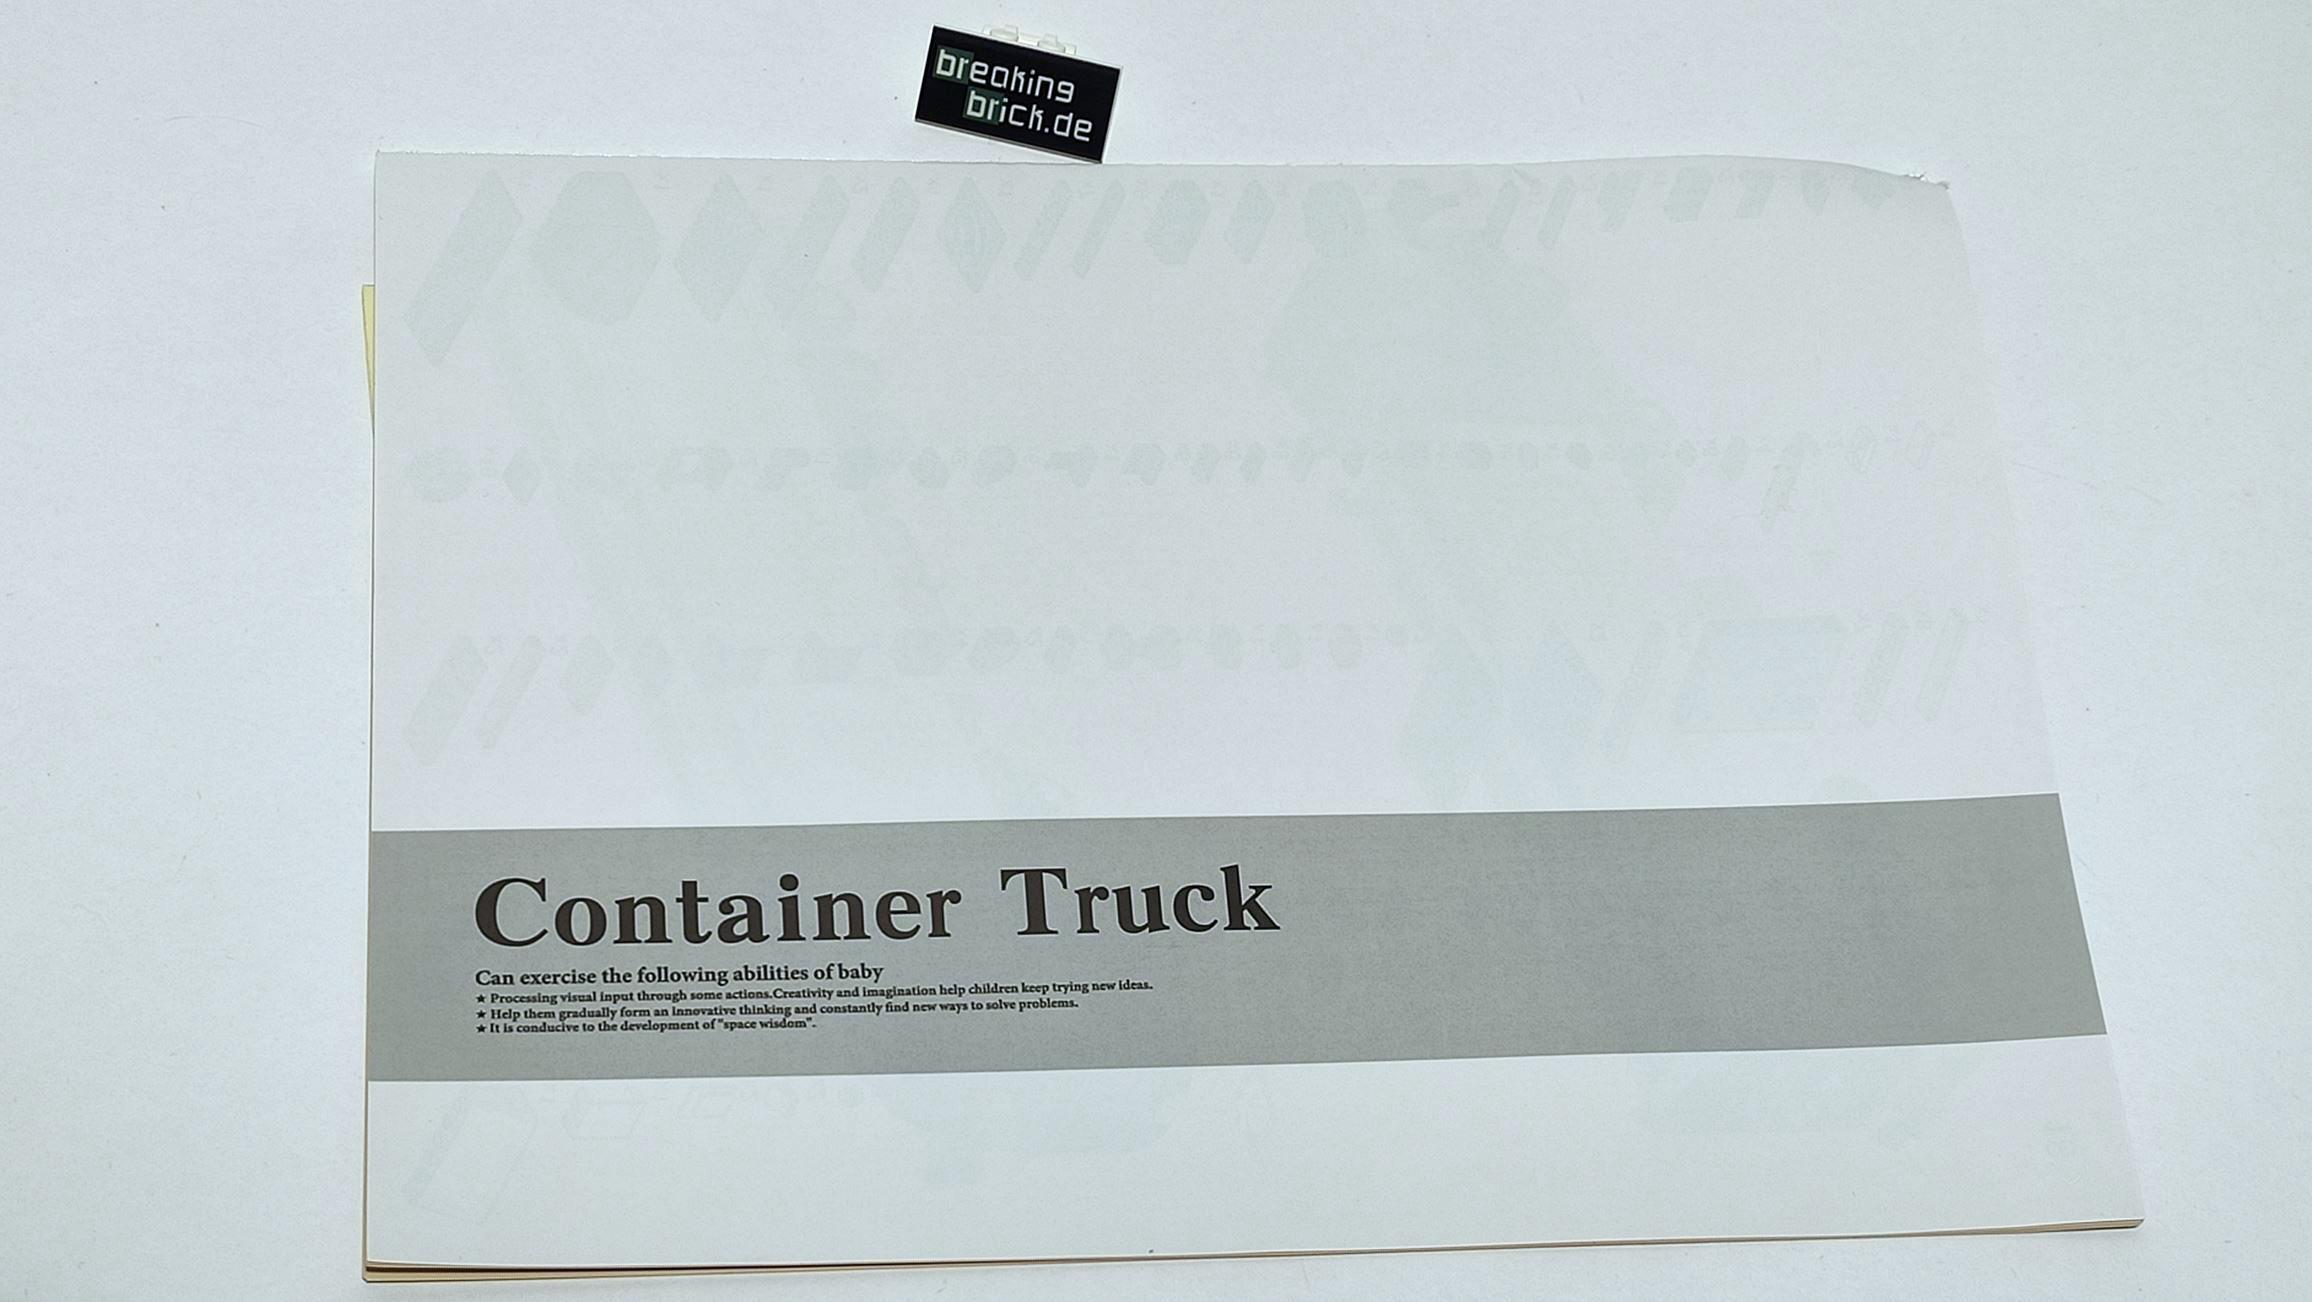 Neun mal Container Truck samt Verpackung. Hier Rückseite.